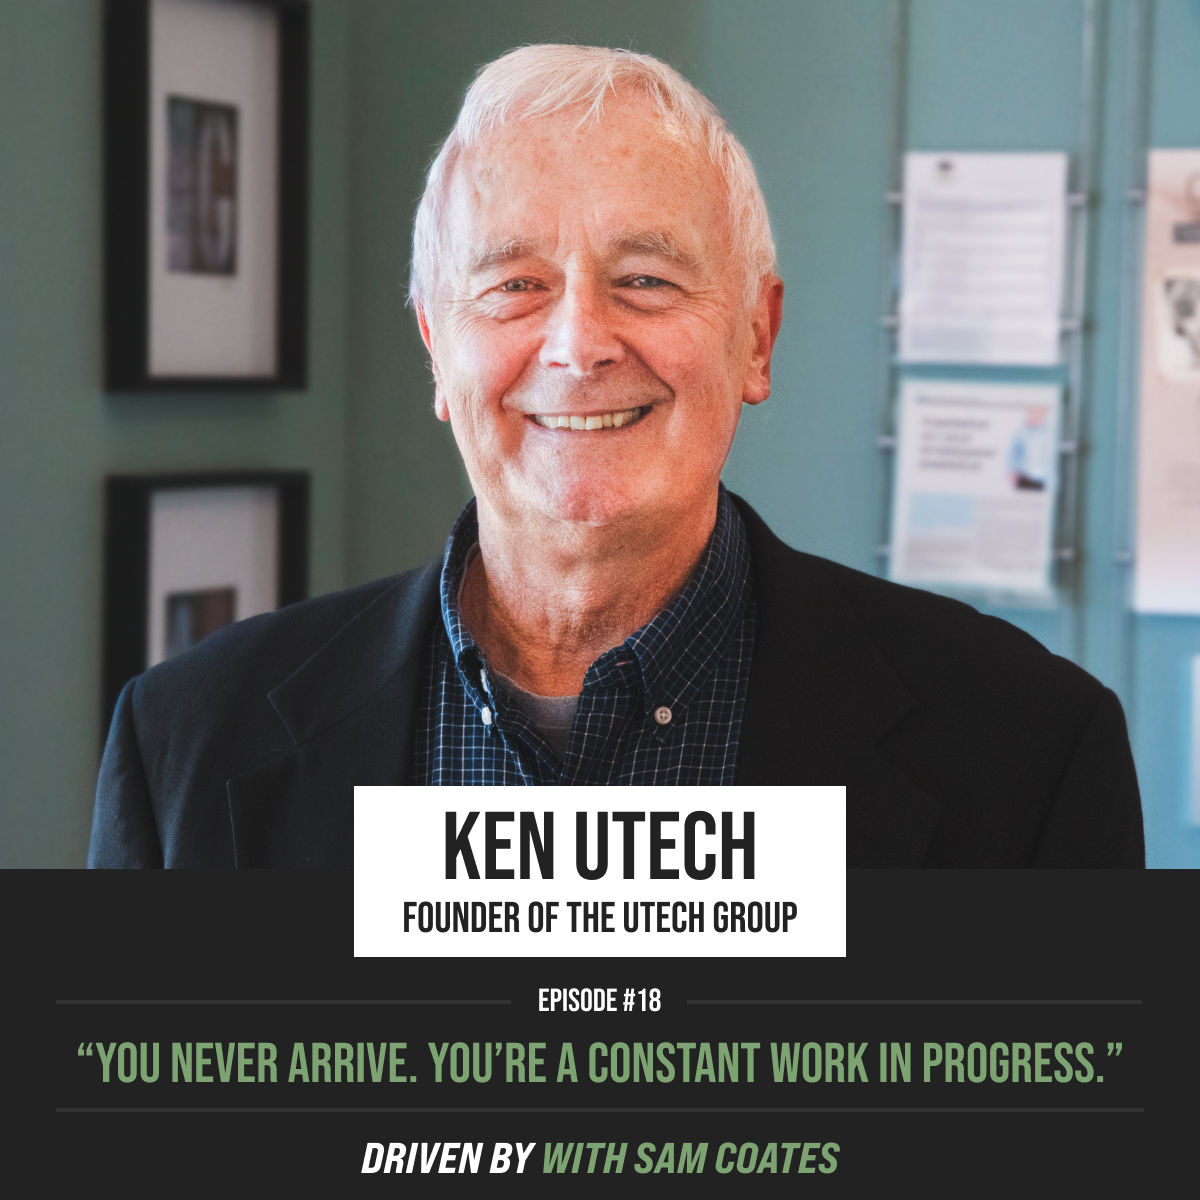 Ken Utech | You Never Arrive. You're a Constant Work in Progress.